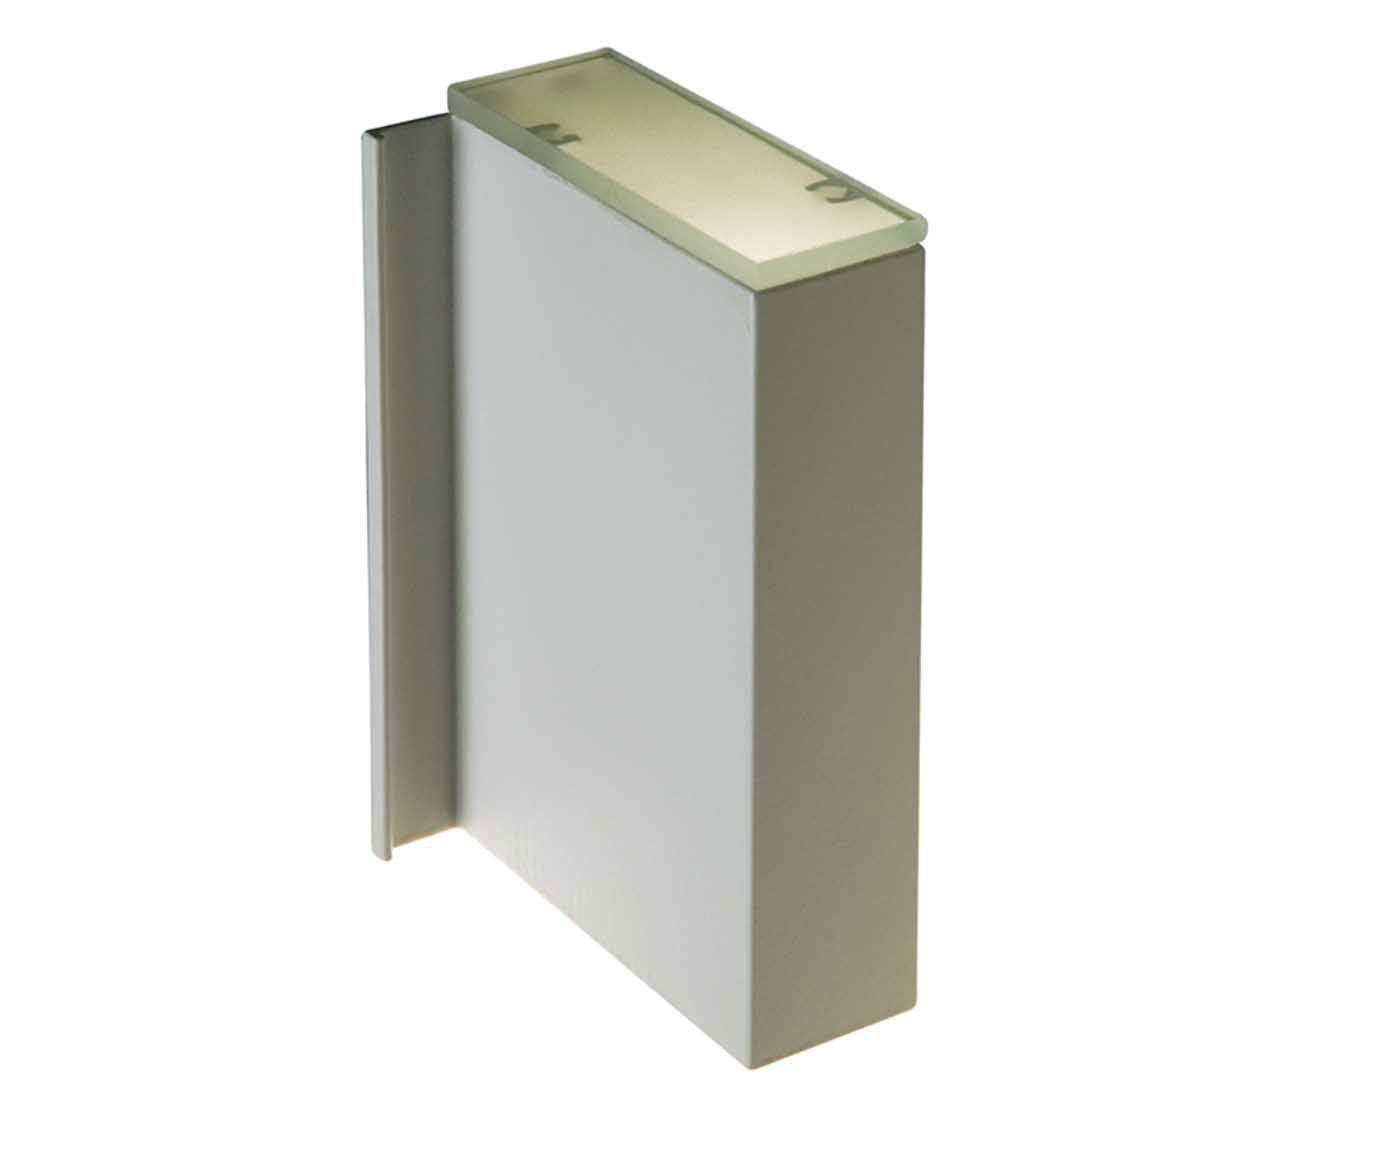 Balizador slot - la lampe | Westwing.com.br